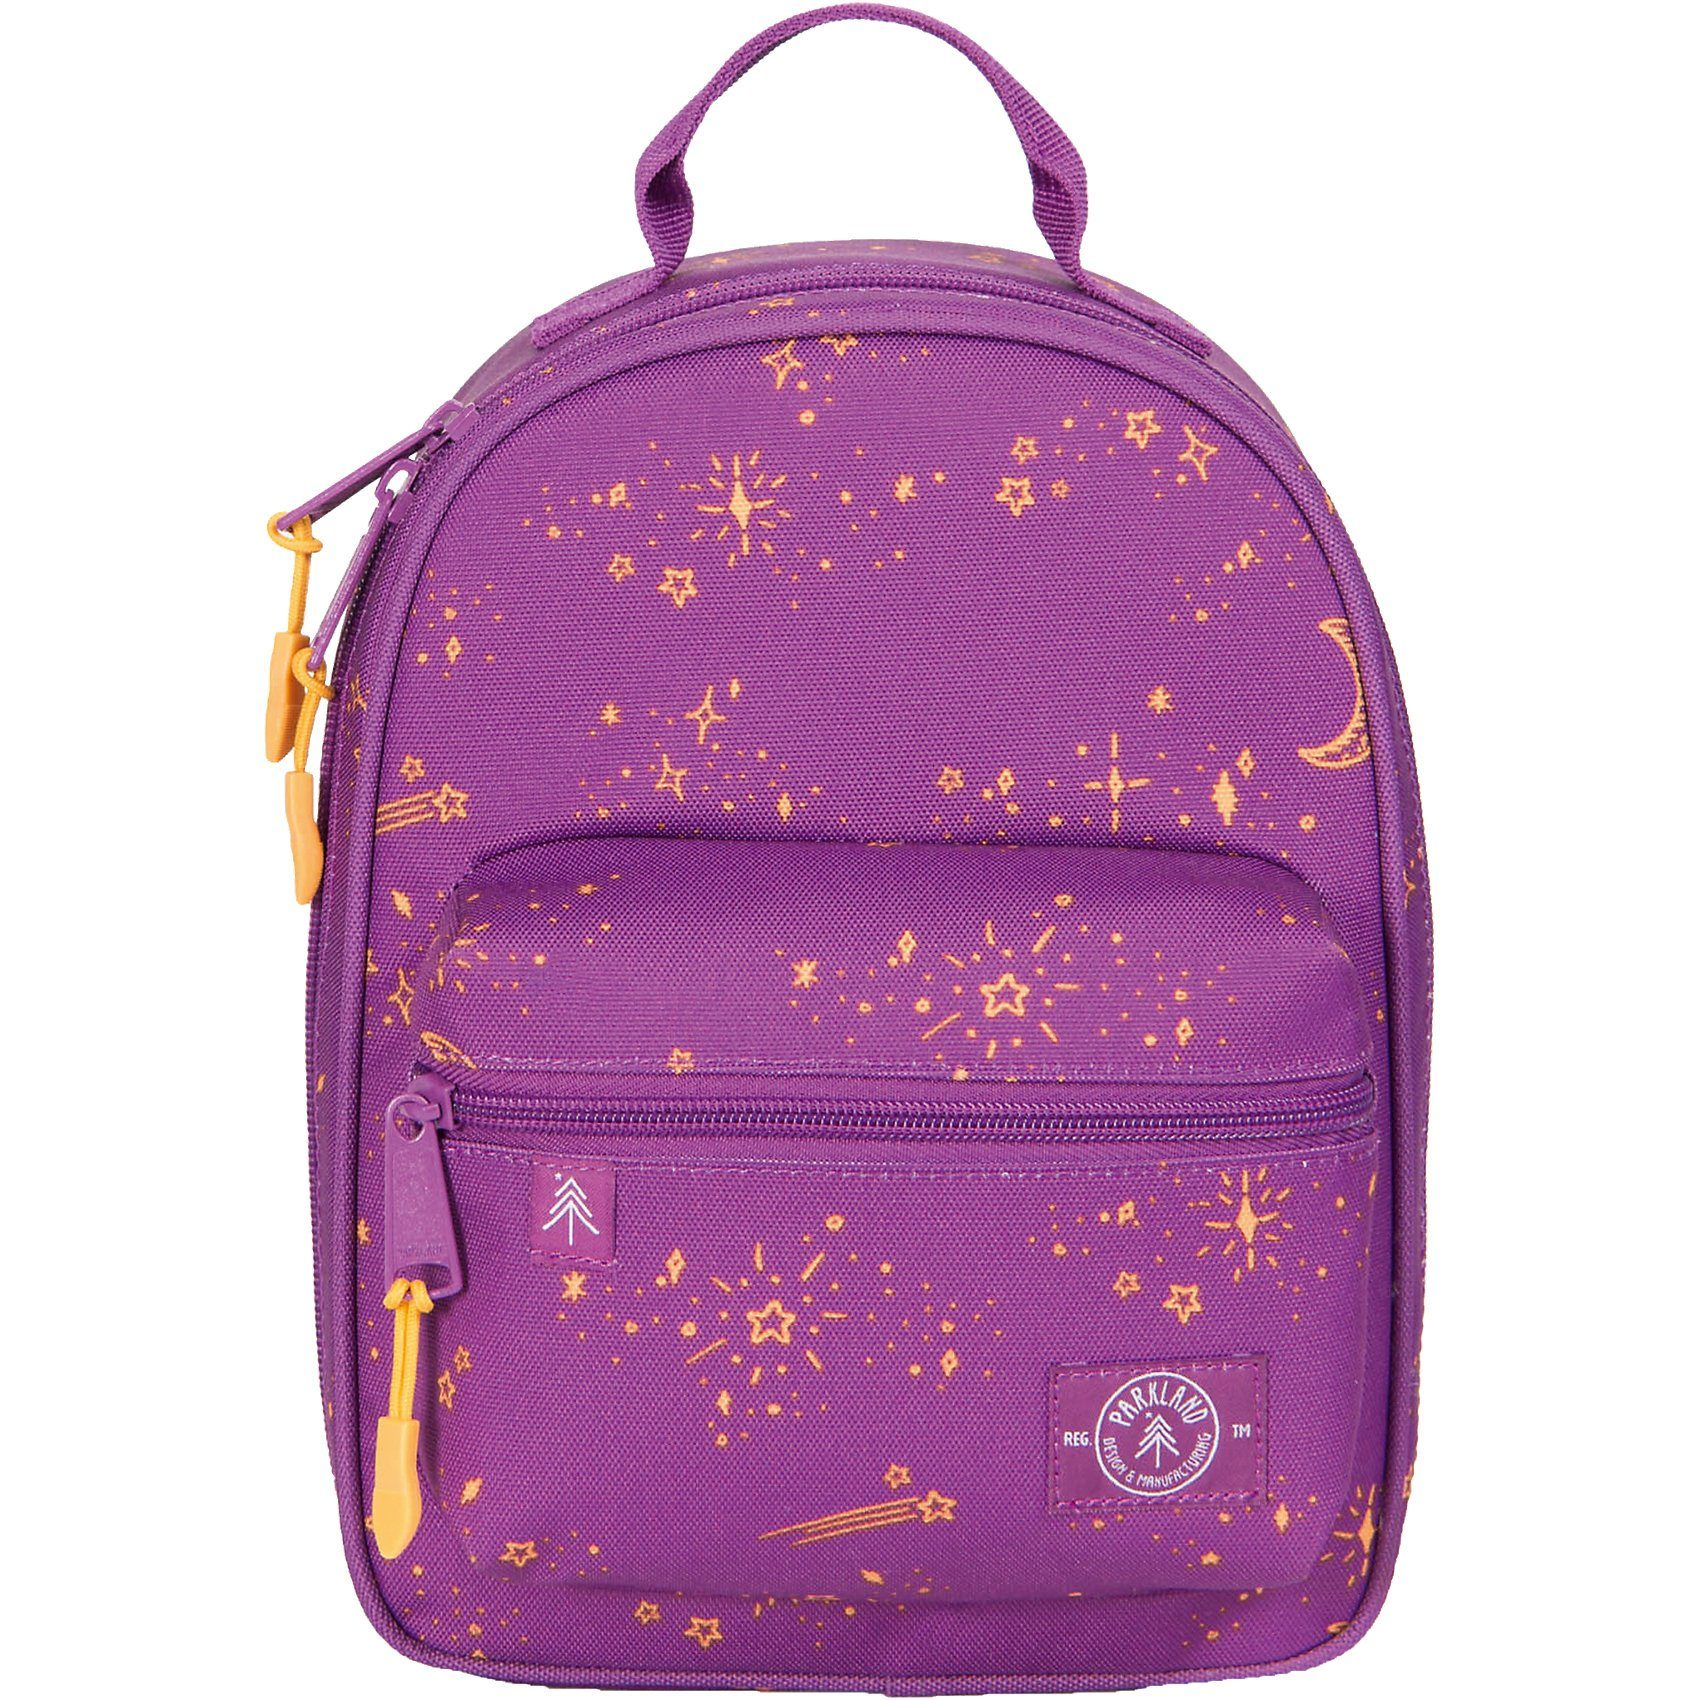 Unisex PARKLAND Kühltasche Lunch Bag THE RODEO Sweet Dreams  | 00828432132393